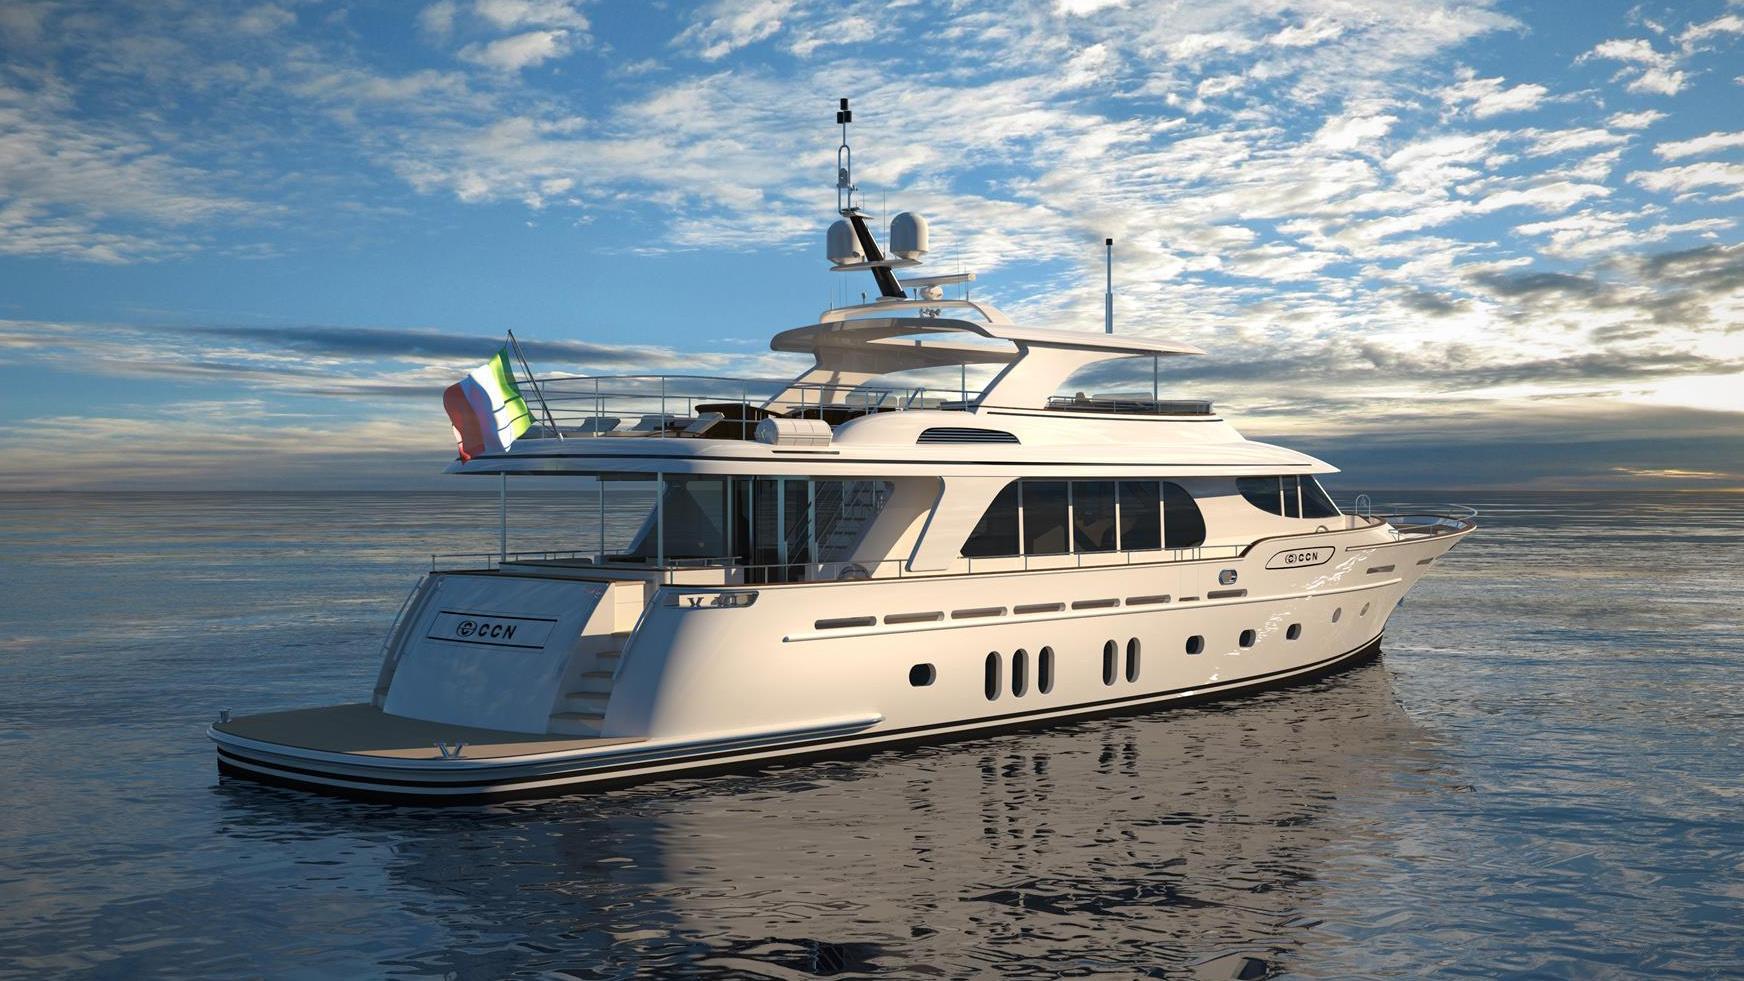 fuoriserie 31m motoryacht ccn 31m 2019 half stern